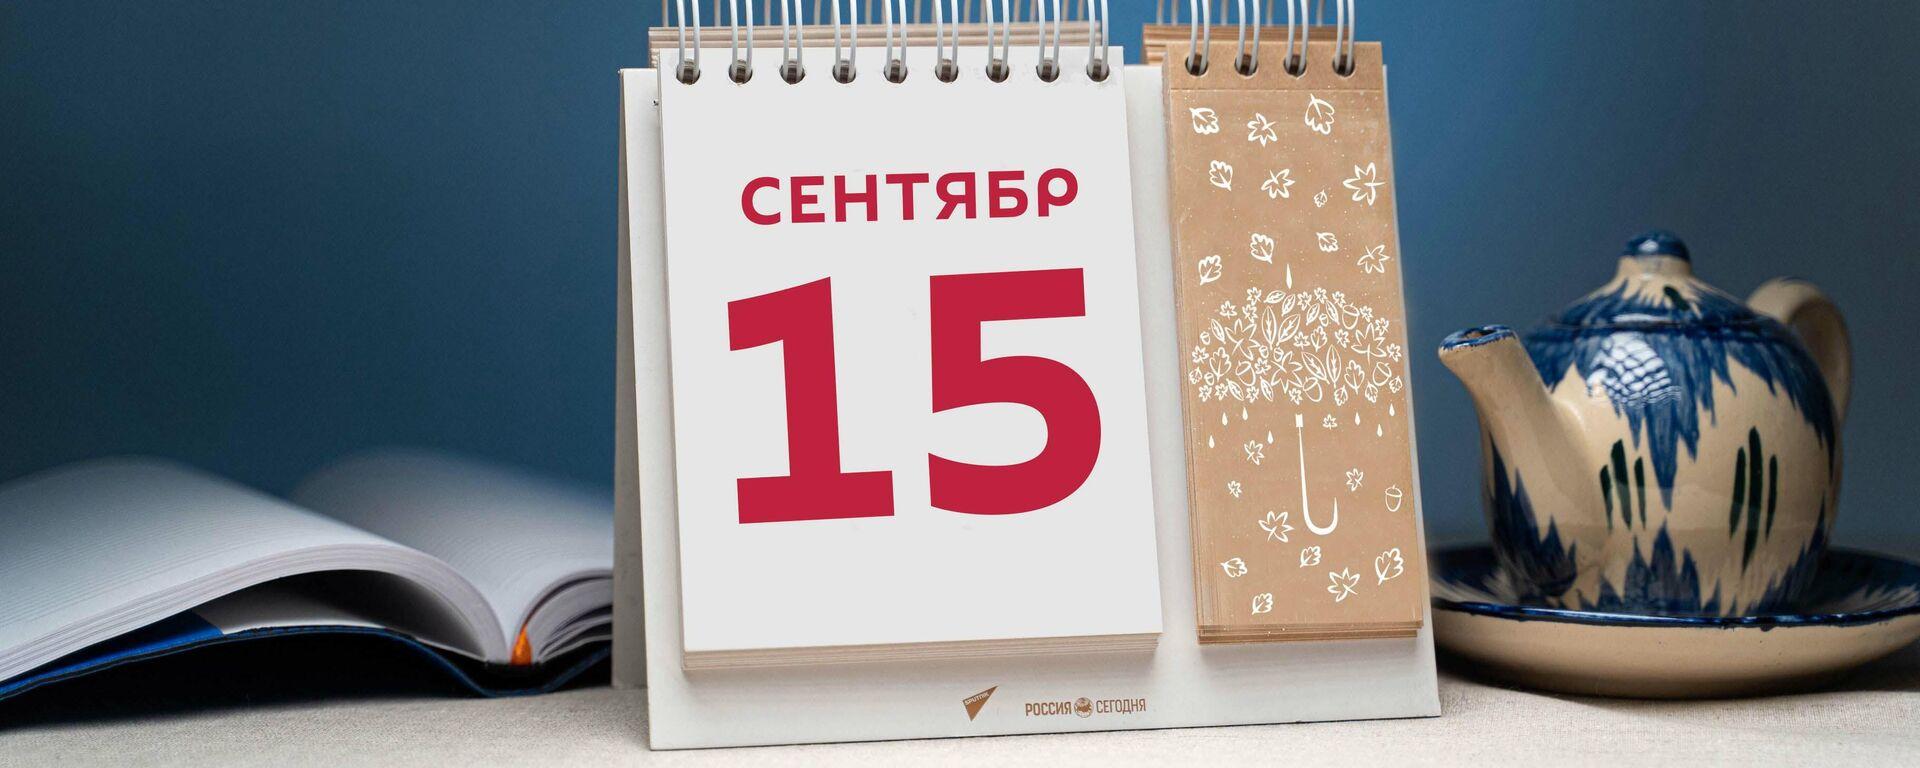 День 15 сентября - Sputnik Тоҷикистон, 1920, 15.09.2021